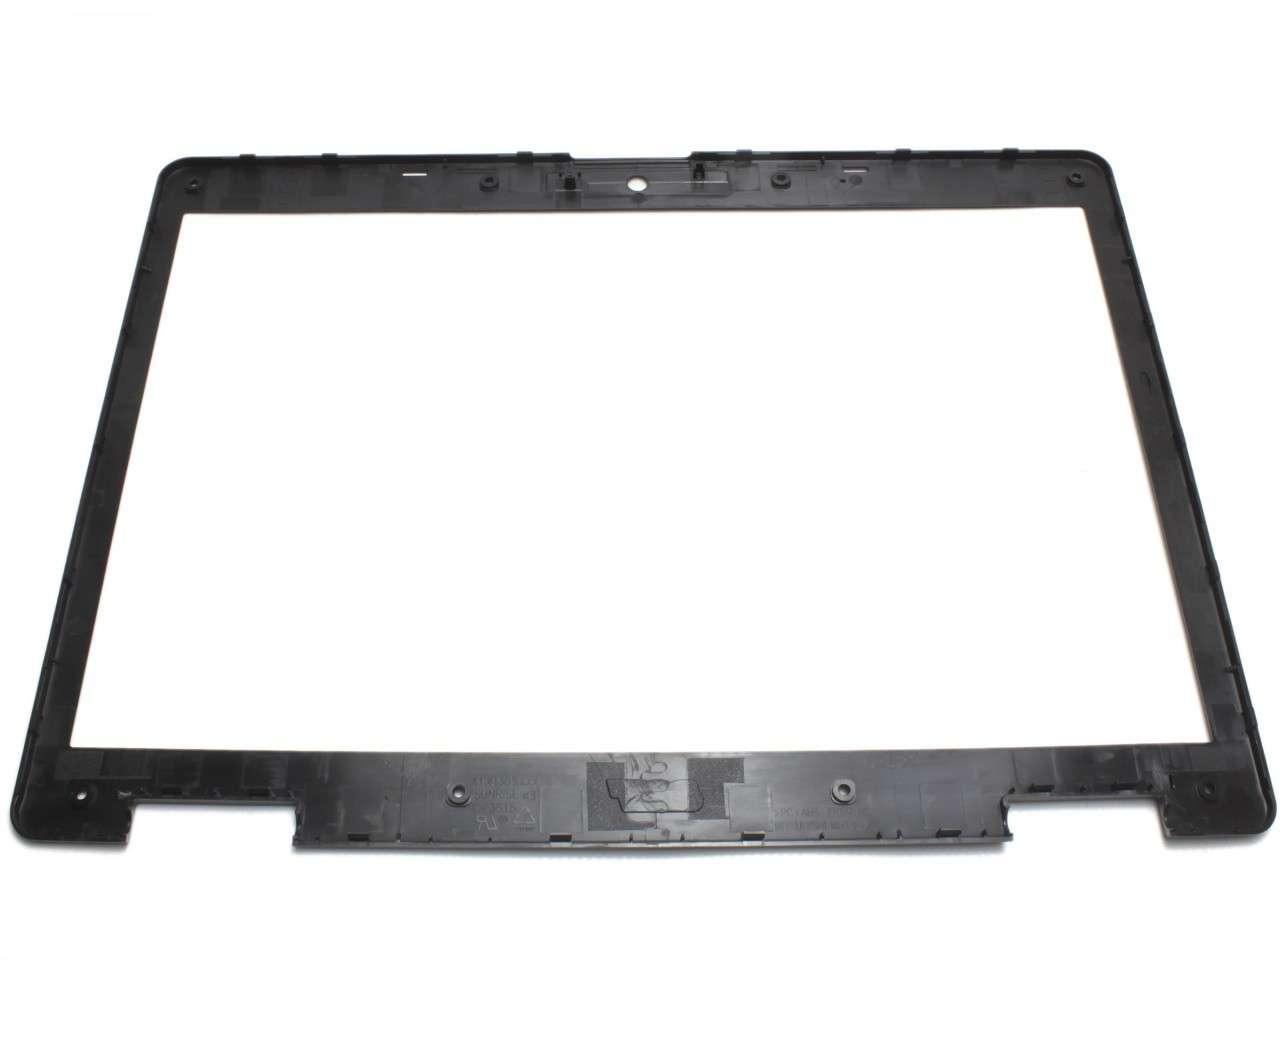 Rama Display Acer Extensa 5420g Bezel Front Cover Neagra imagine